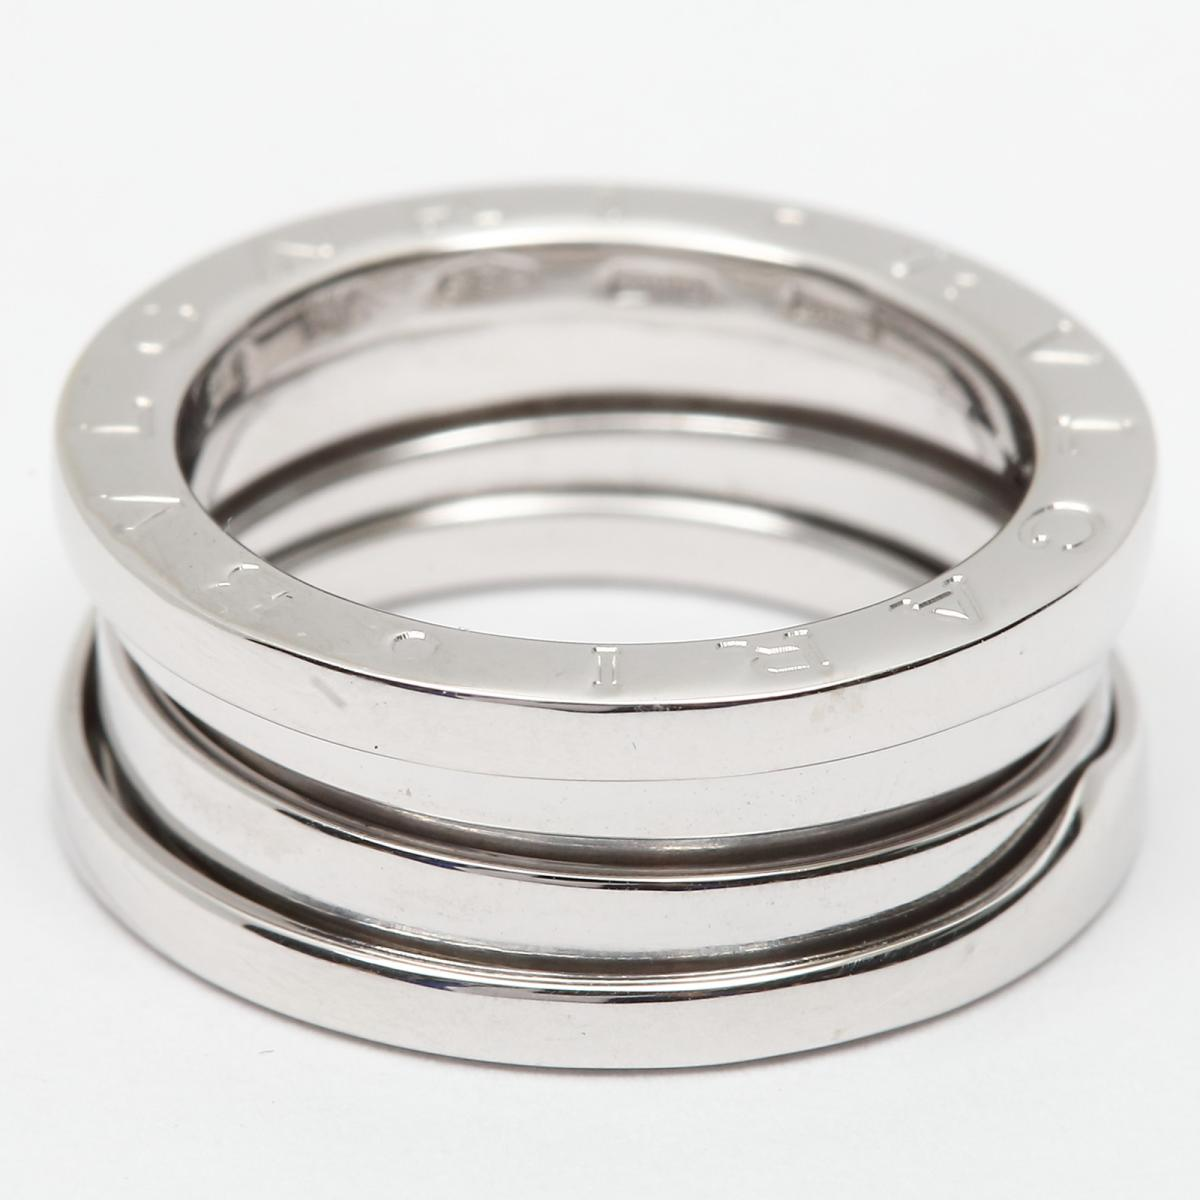 d7a0b5d8ec18 ... ブルガリB-zero1リングSサイズビーゼロワン指輪レディースK18WG(750 ...